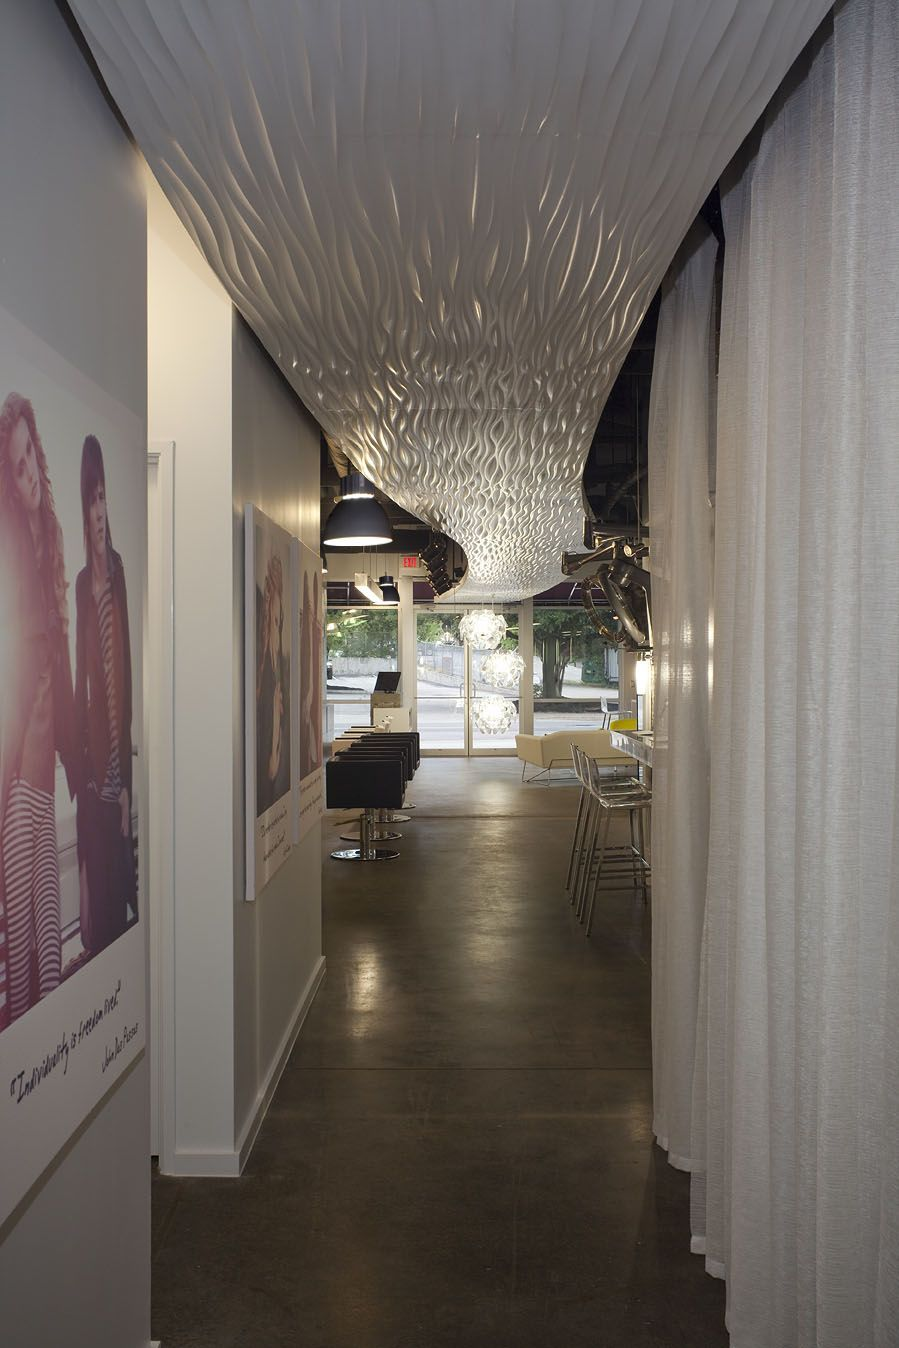 Dick clark architecture propaganda hair salon - Maison contemporaine dick clark architecture ...